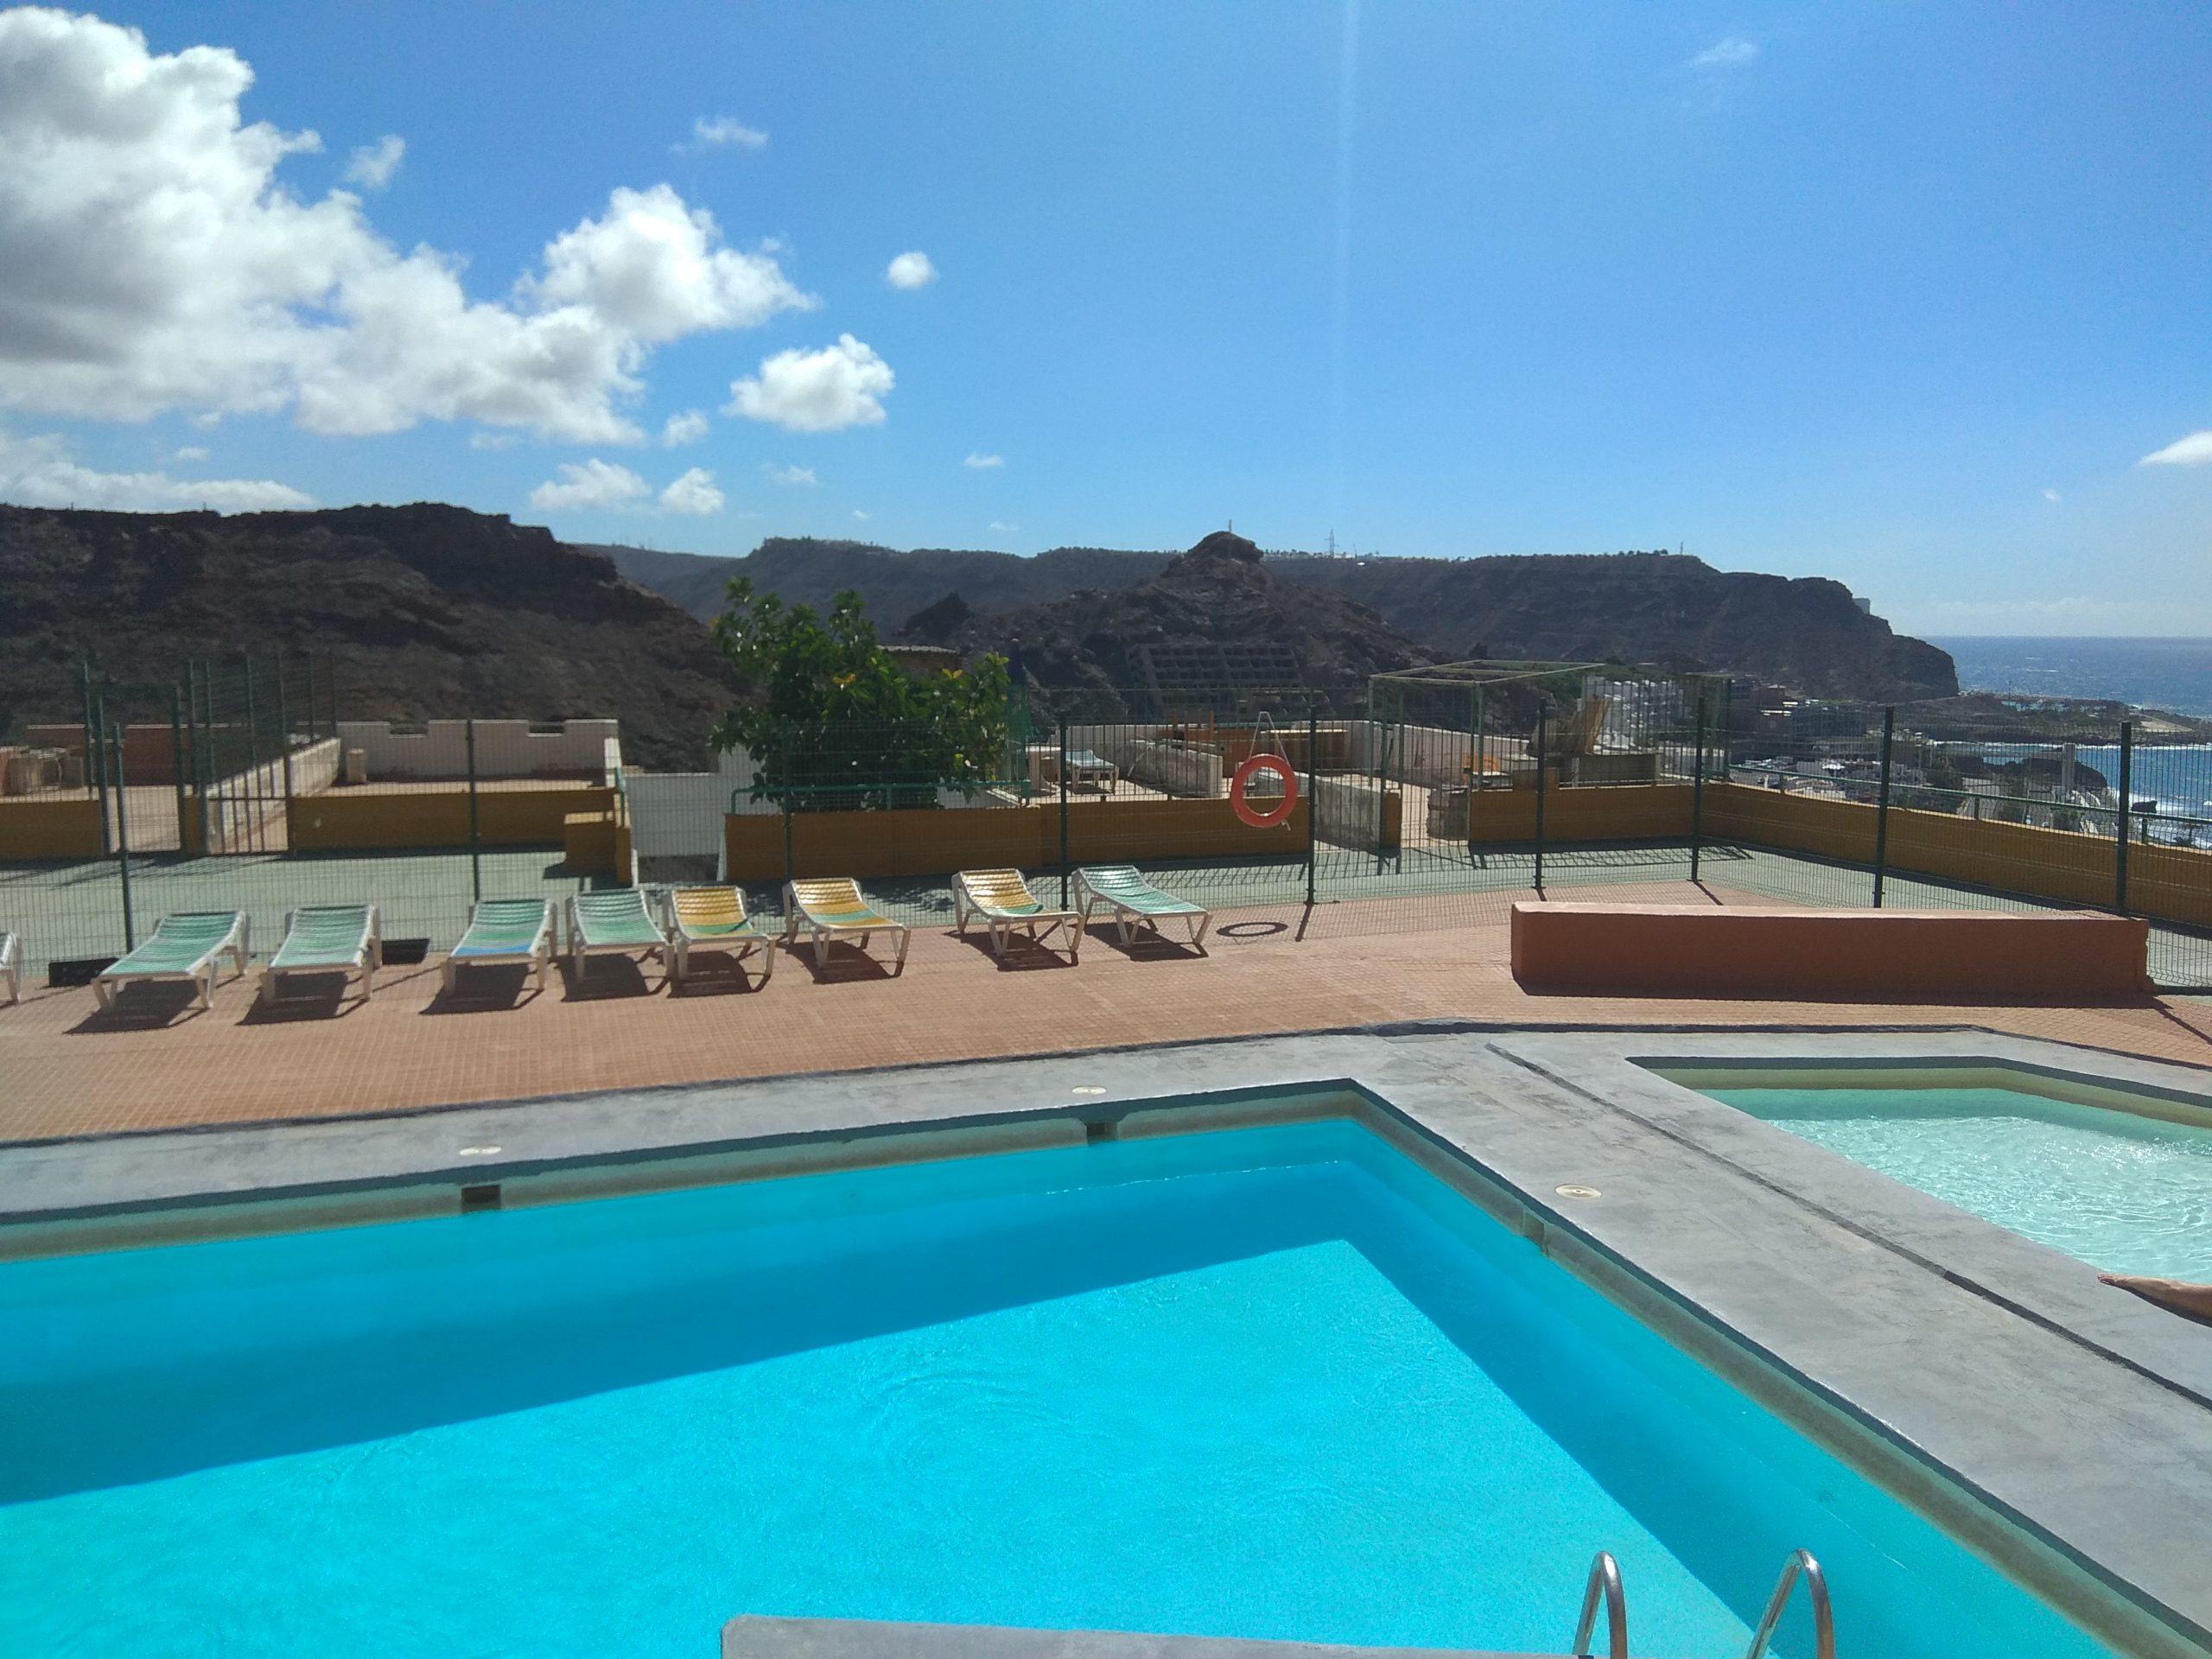 2 Bedroom Apartment in Demelza Beach – Playa del Cura